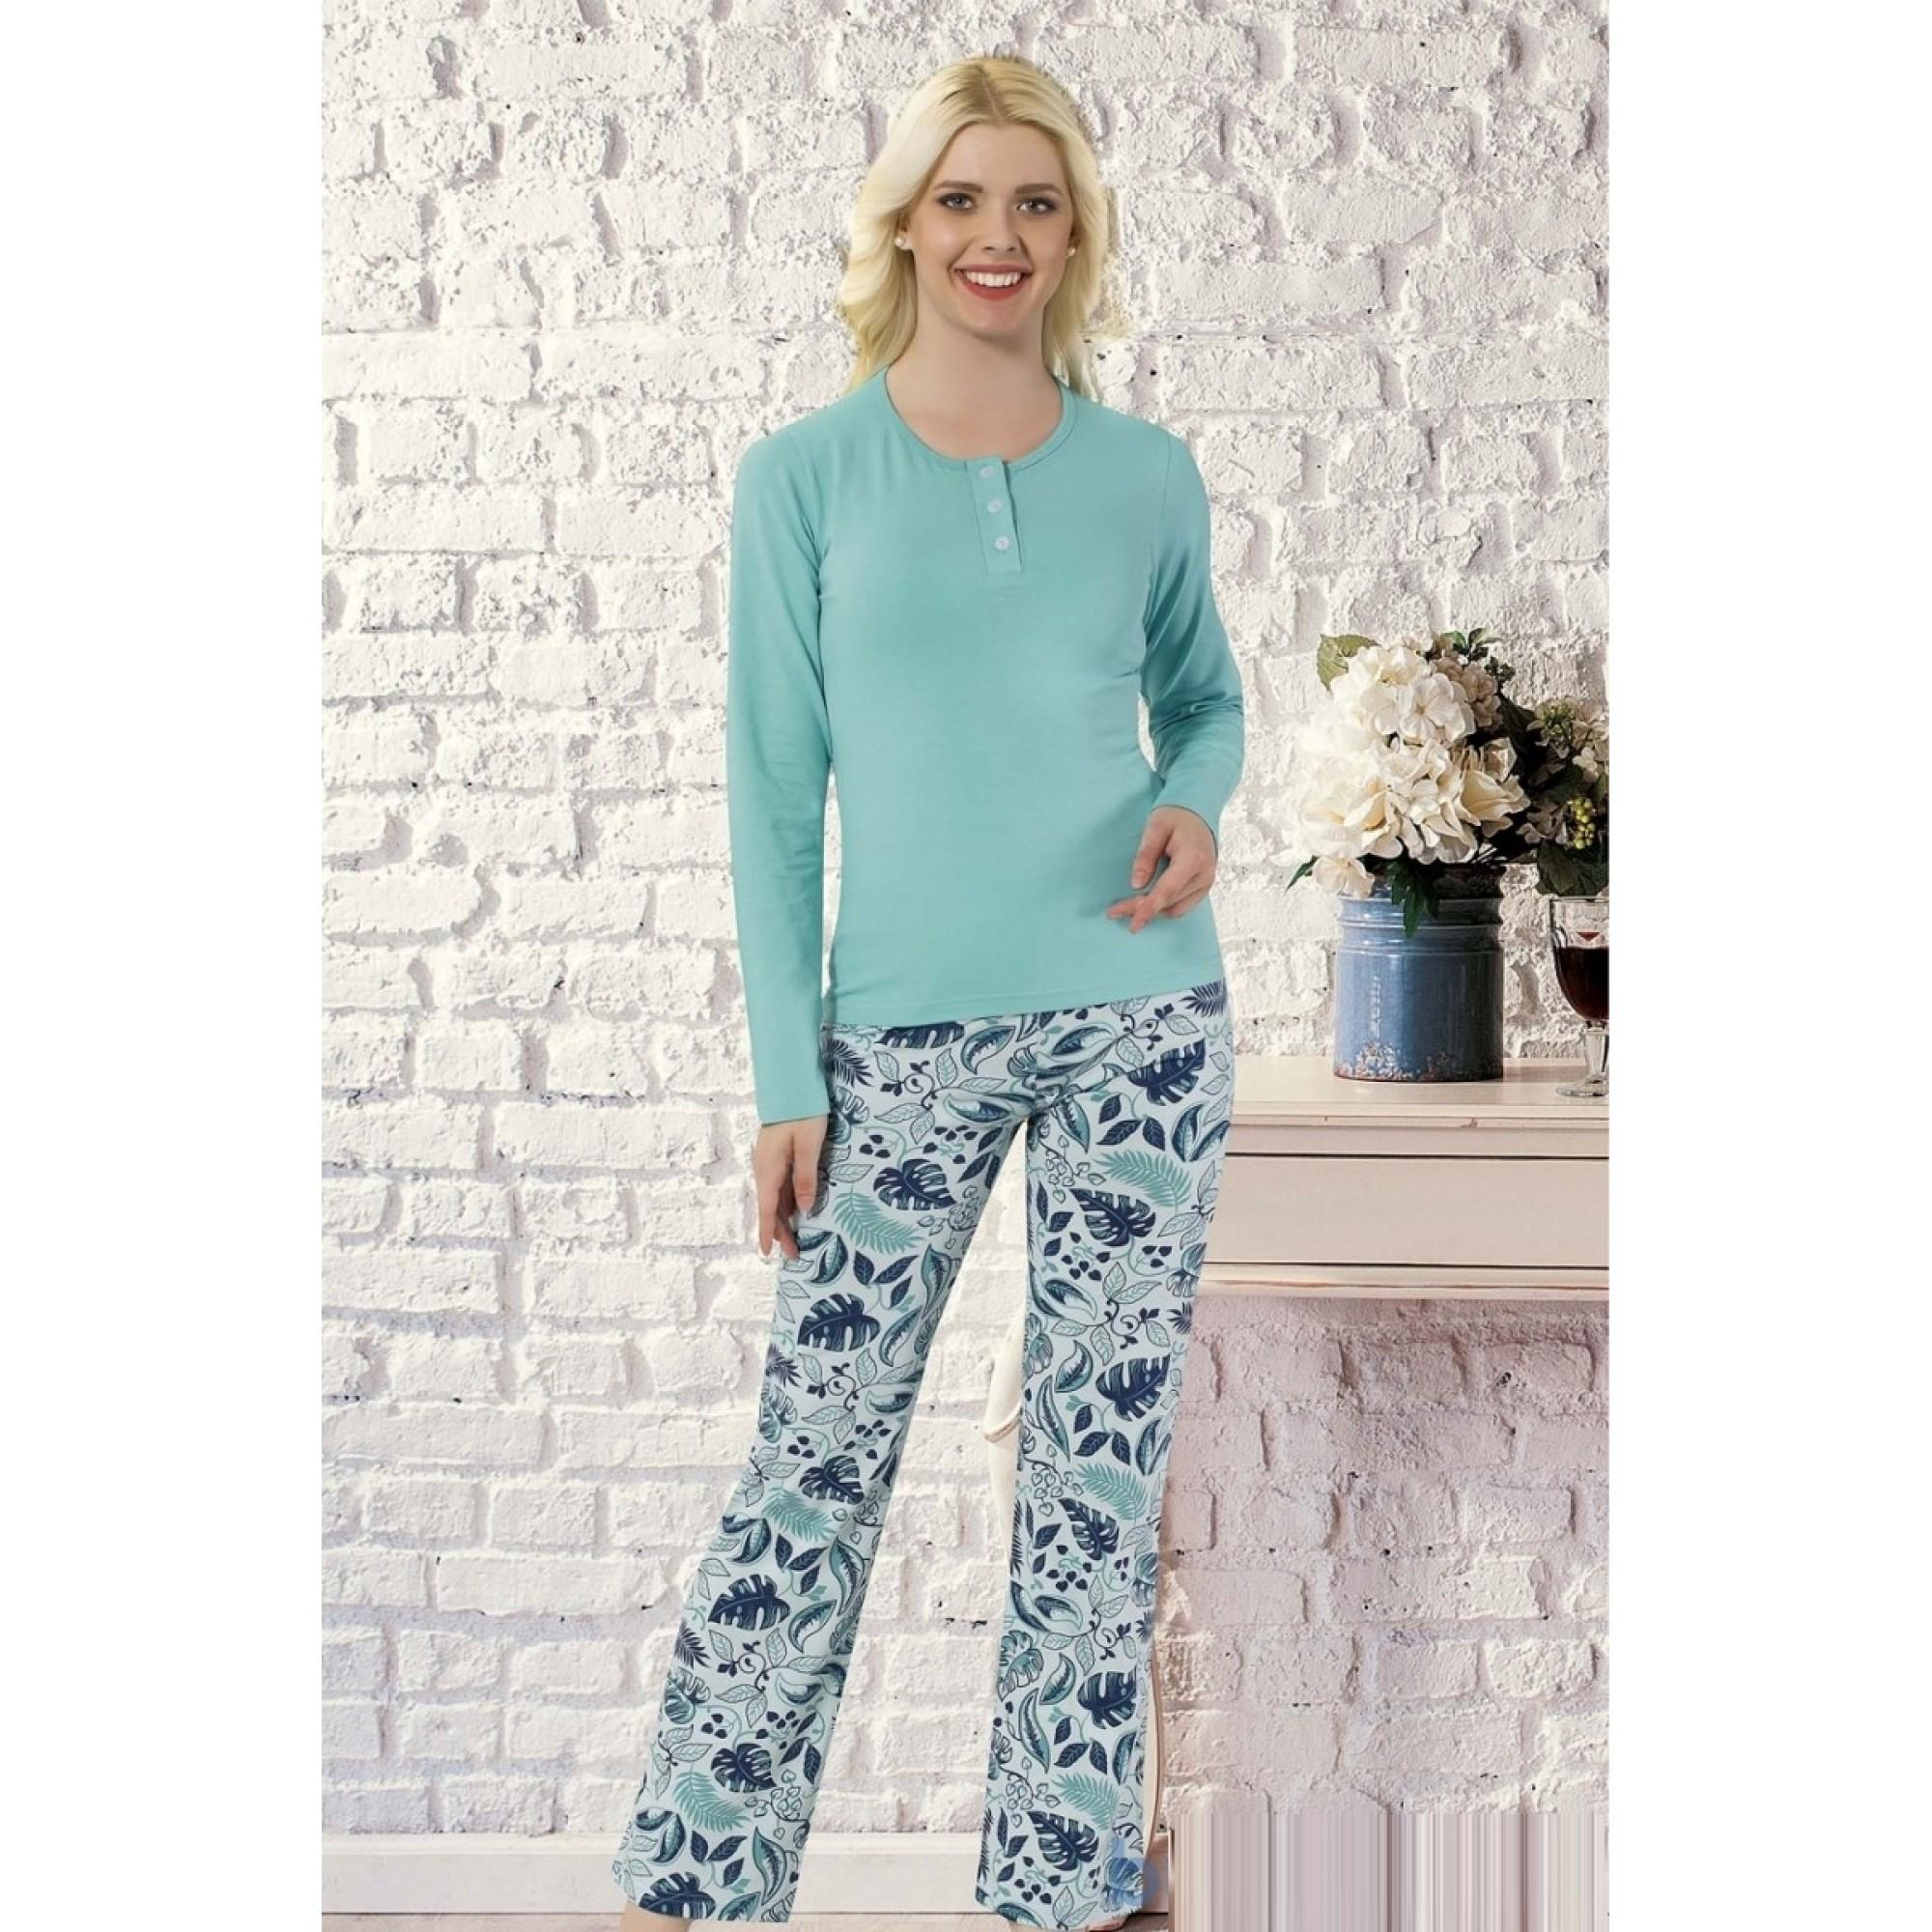 Дамска пижама Blue Flowers - Модал